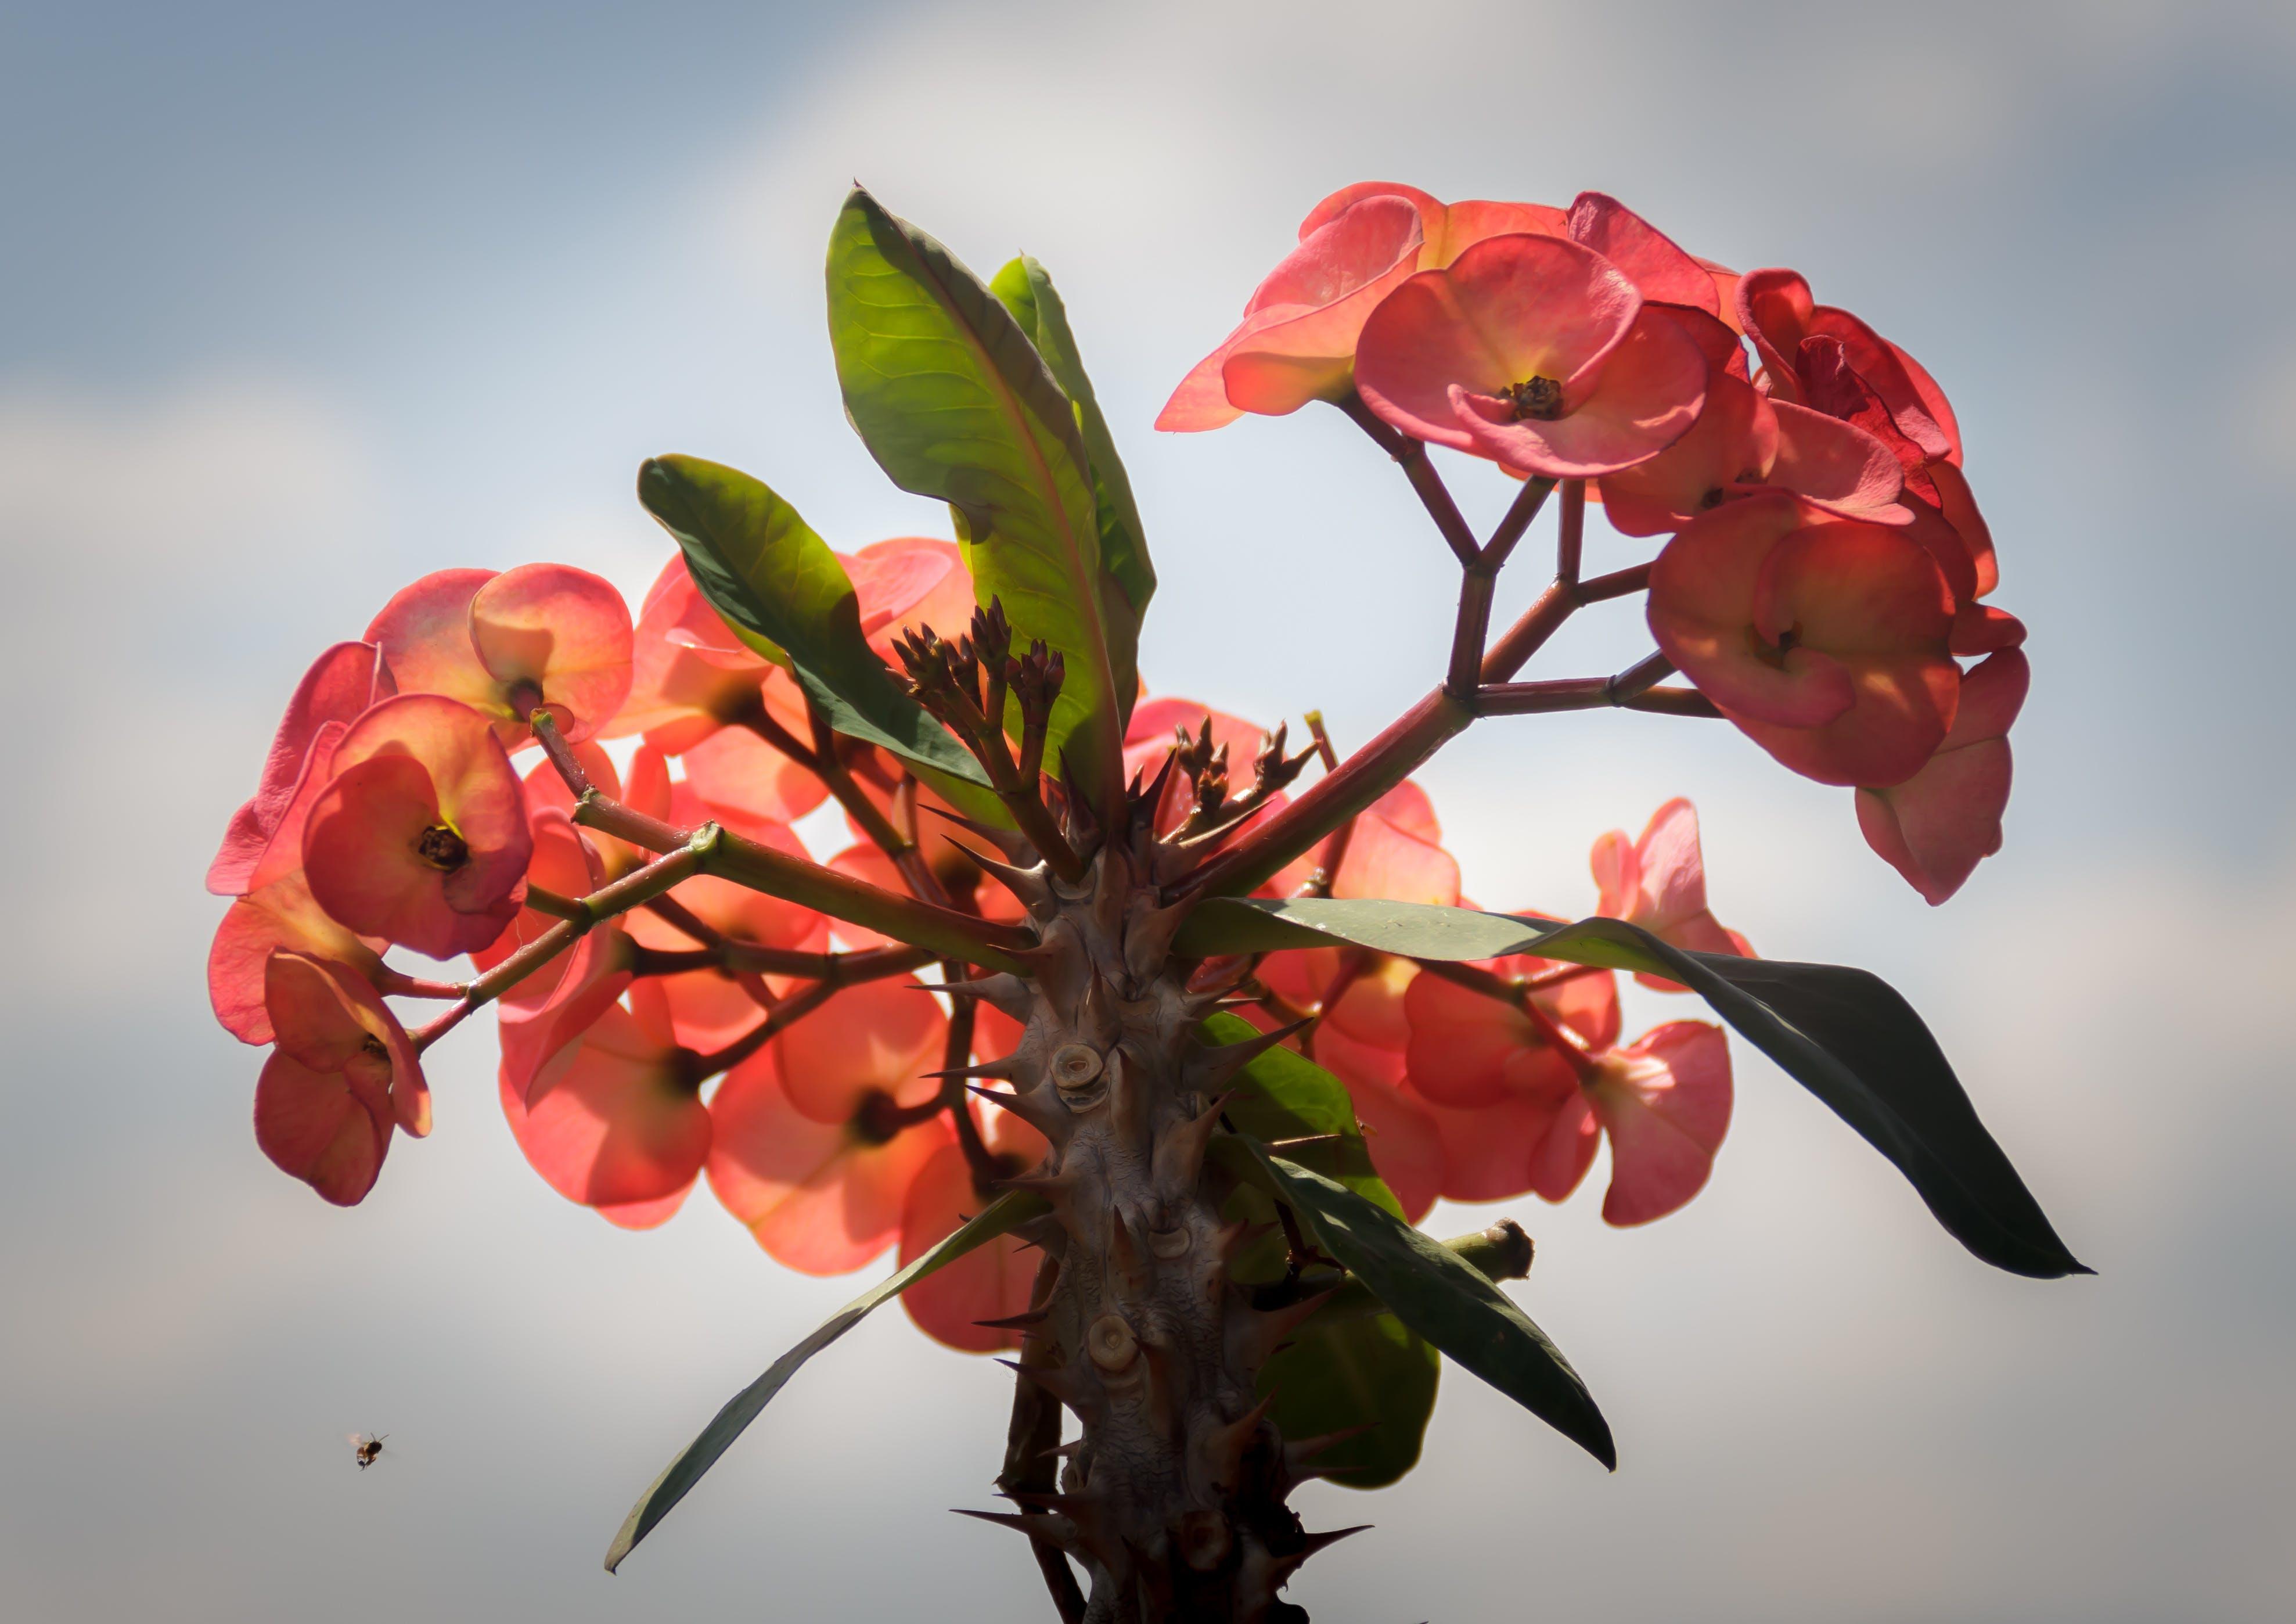 Close-up Photography of Euphorbia